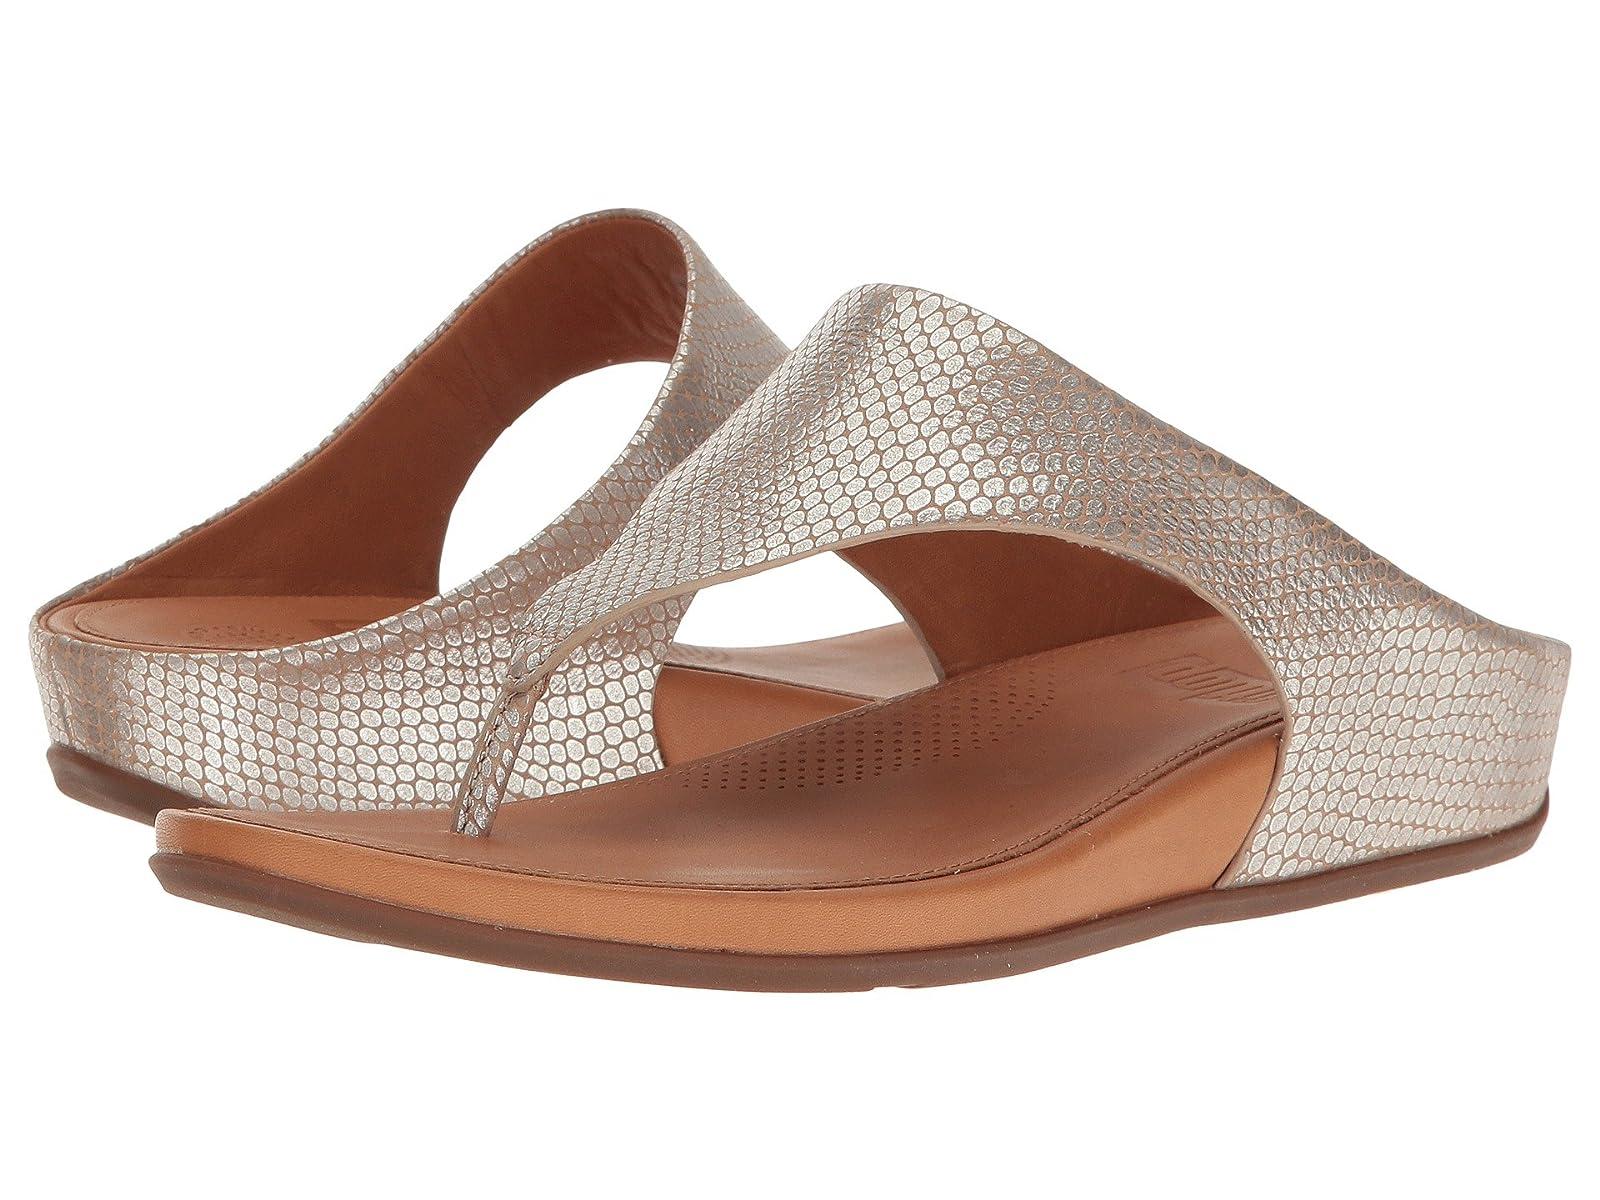 FitFlop Banda ToepostCheap and distinctive eye-catching shoes